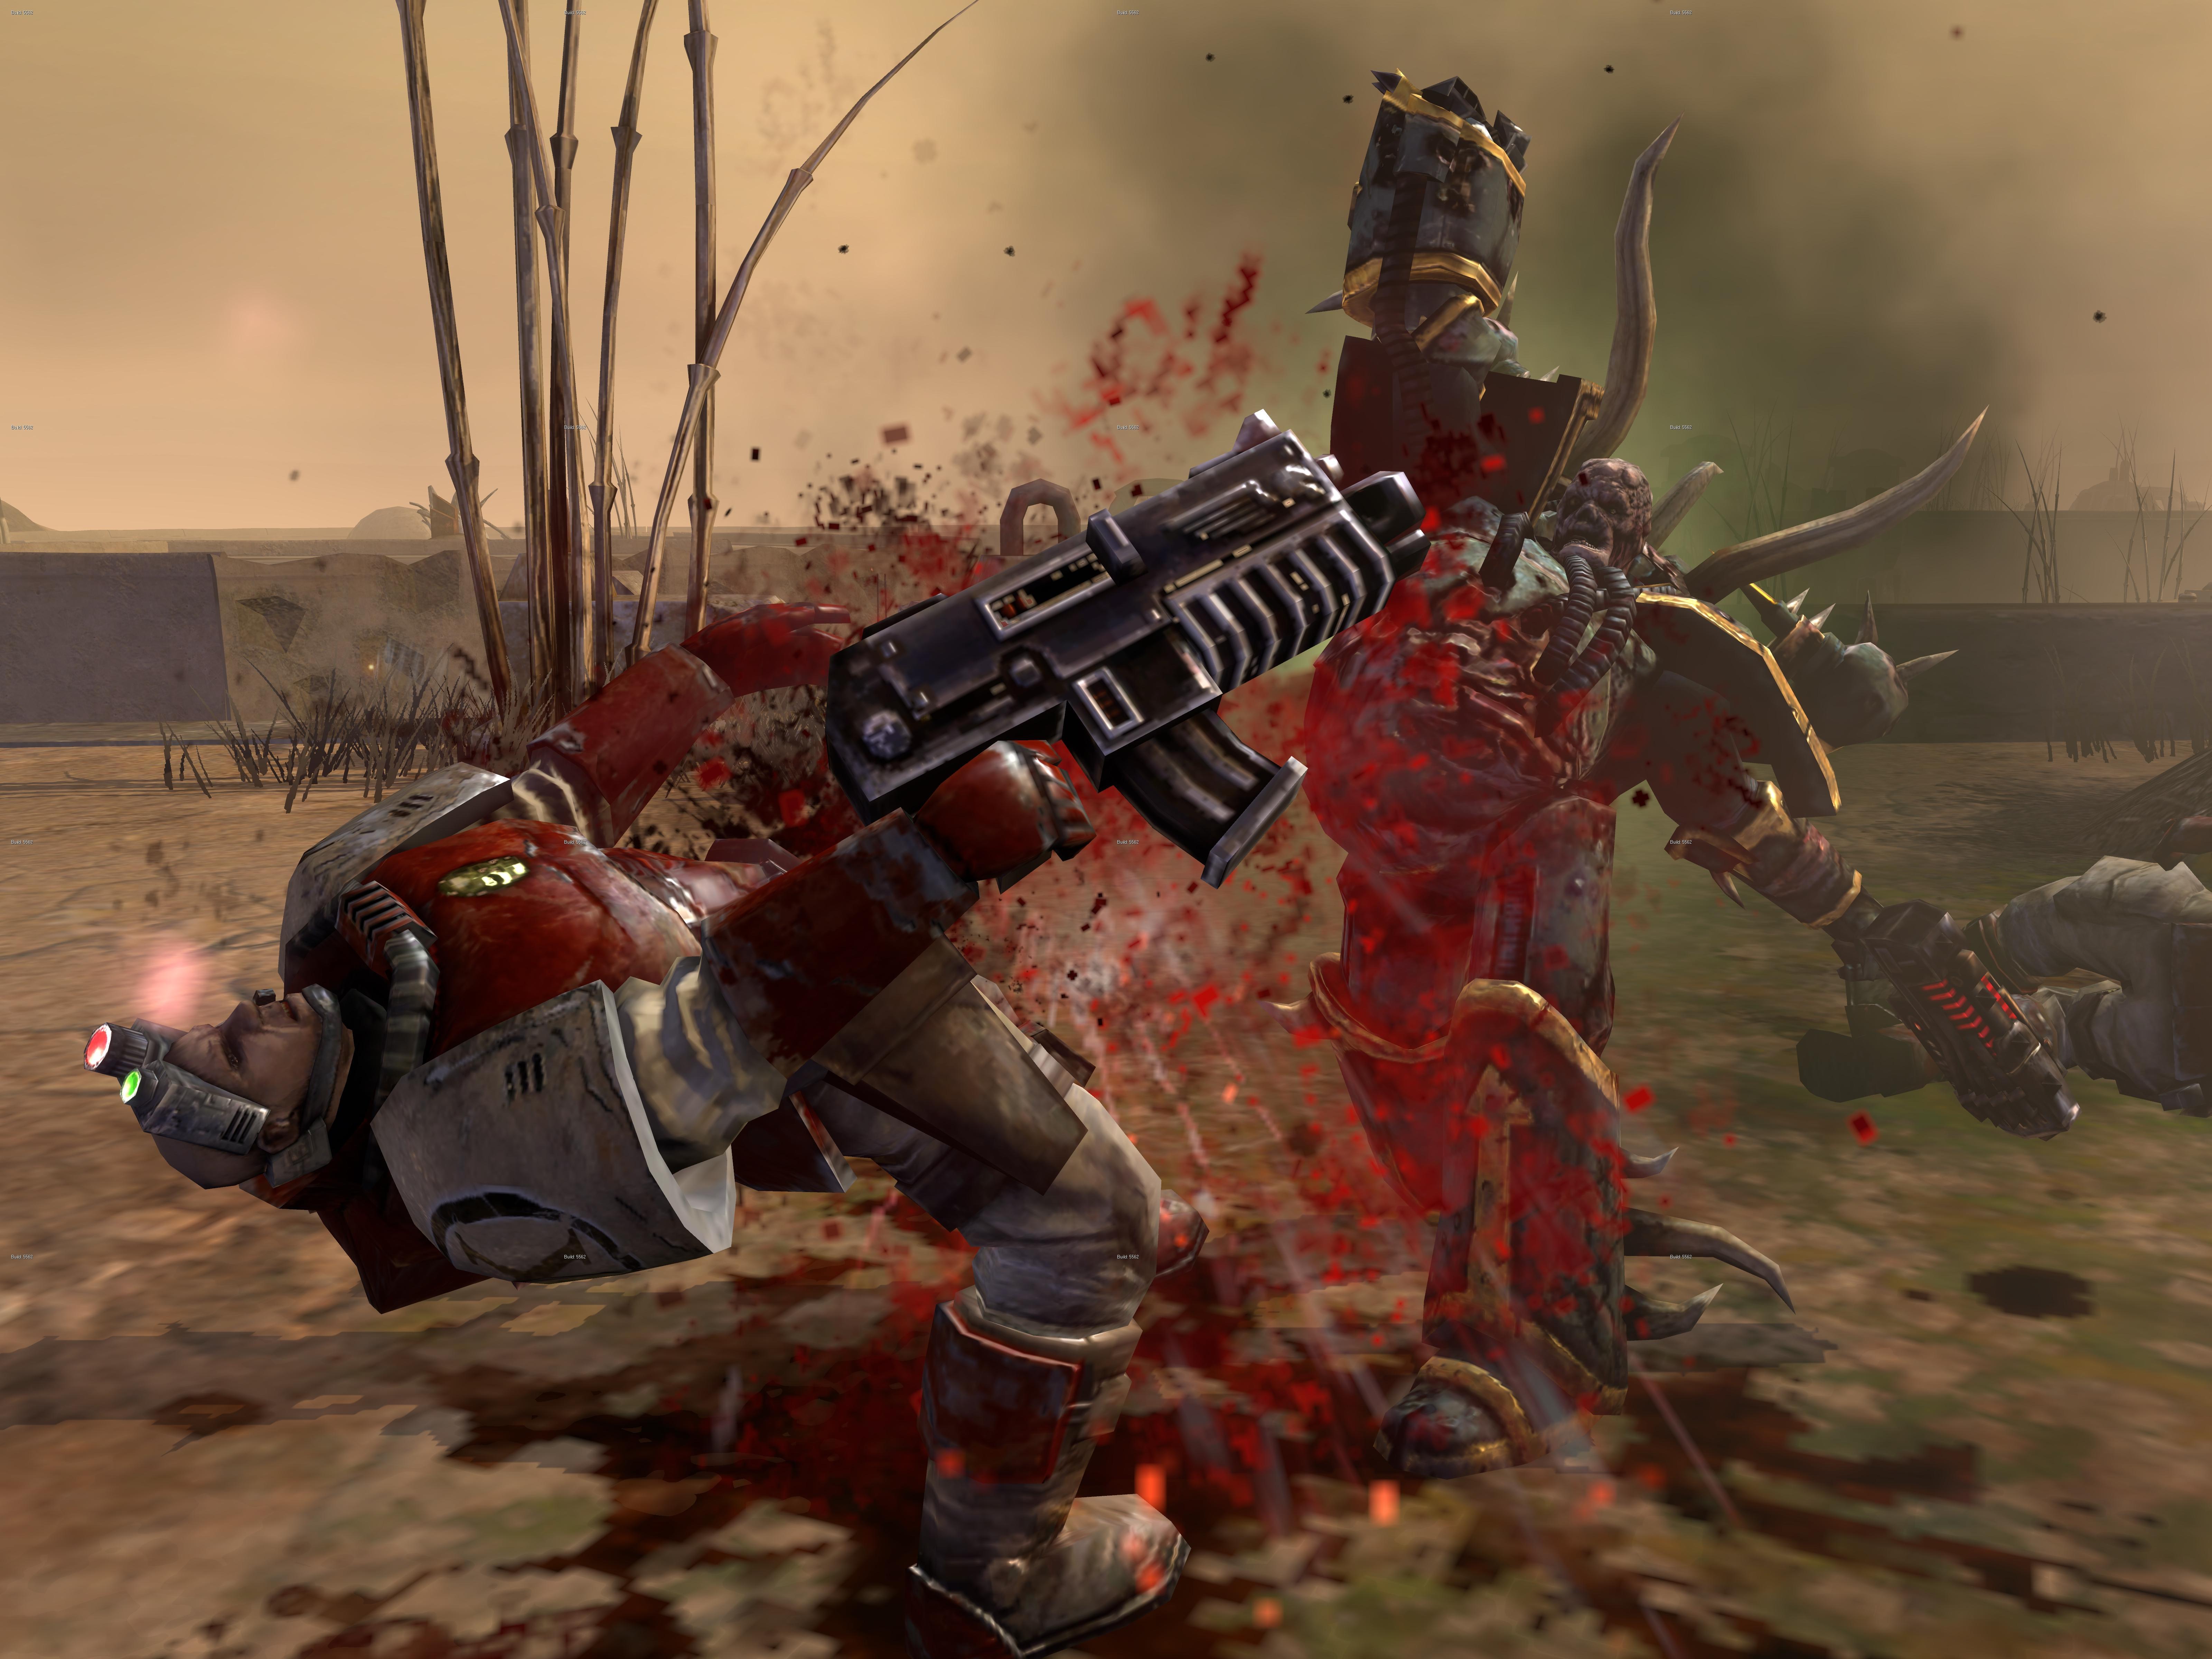 Warhammer 40,000: Dawn of War II - Retribution Chaos Space Marines Race Pack screenshot